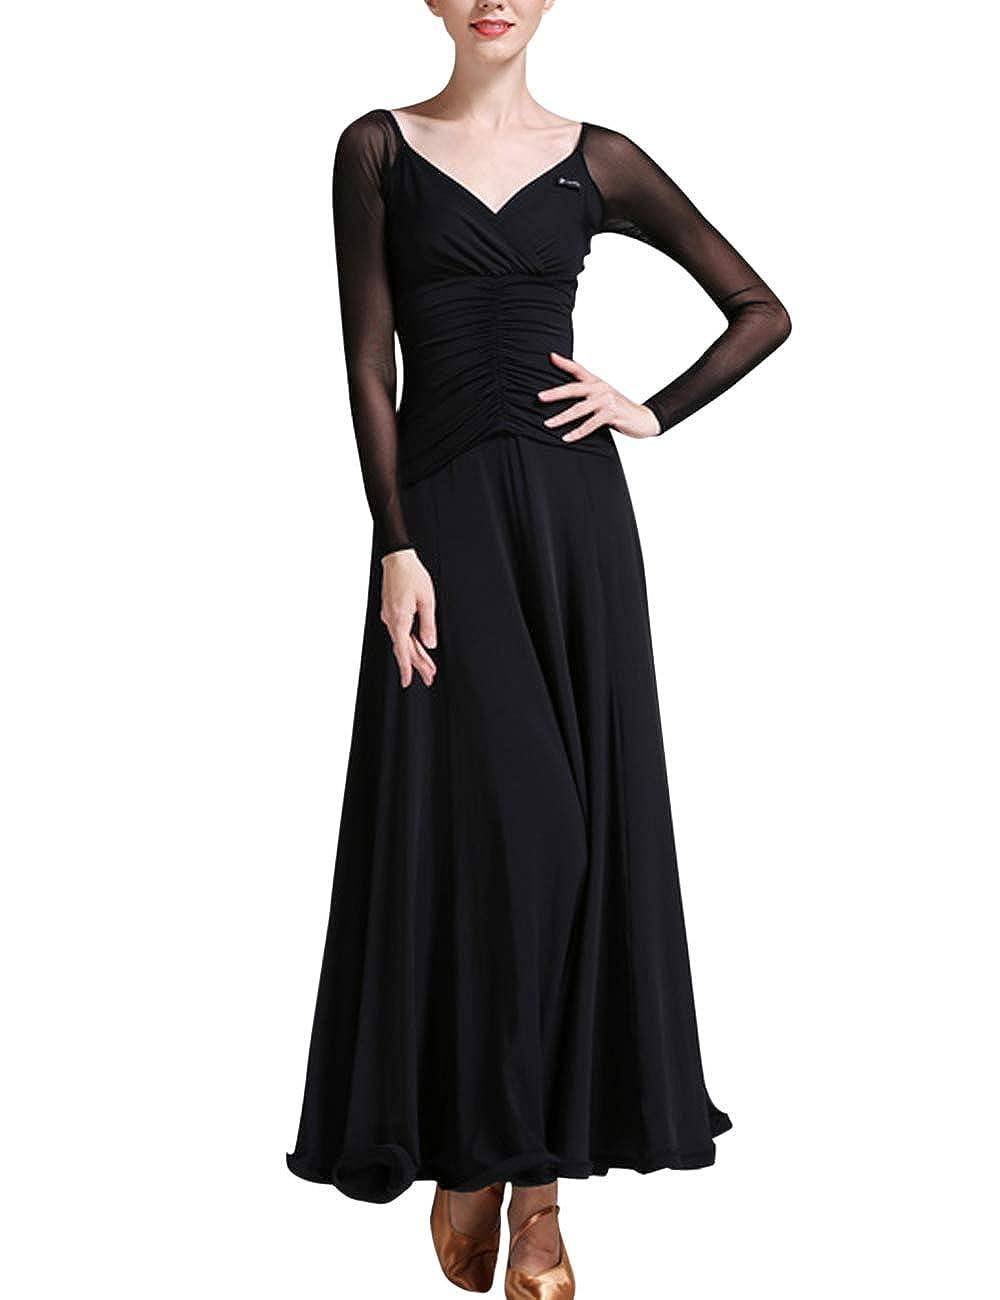 Black Zhhlinyuan Womens Waltz Modern Dance Dress  VNeck Latin Ballroom Dancing Dresses